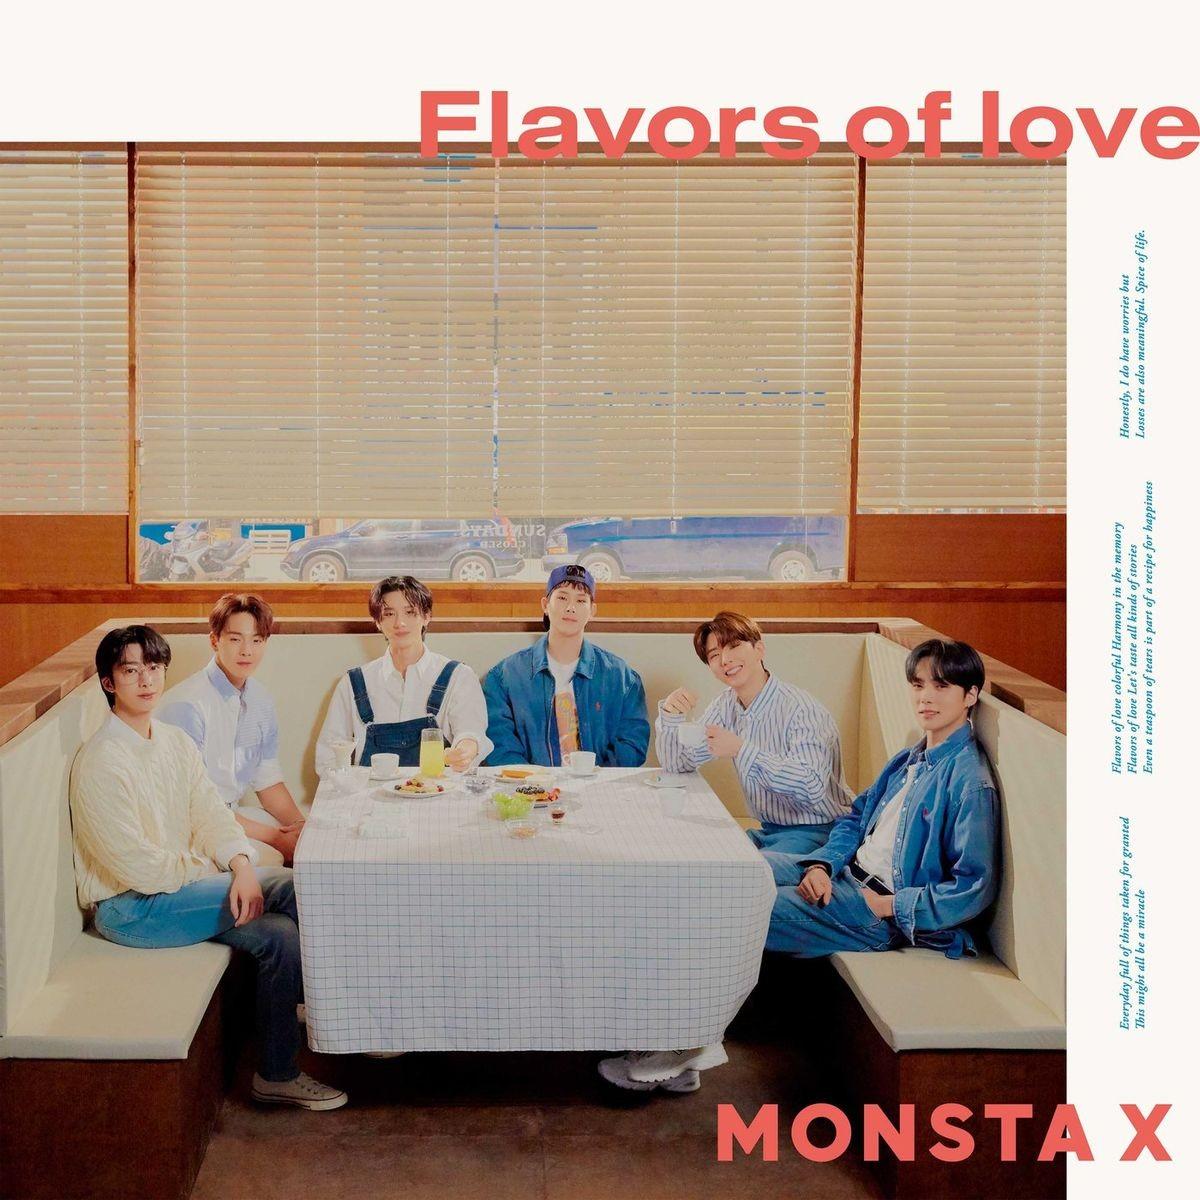 MONSTA X (몬스타엑스) – Flavors Of Love [FLAC / WEB] [2021.05.05]